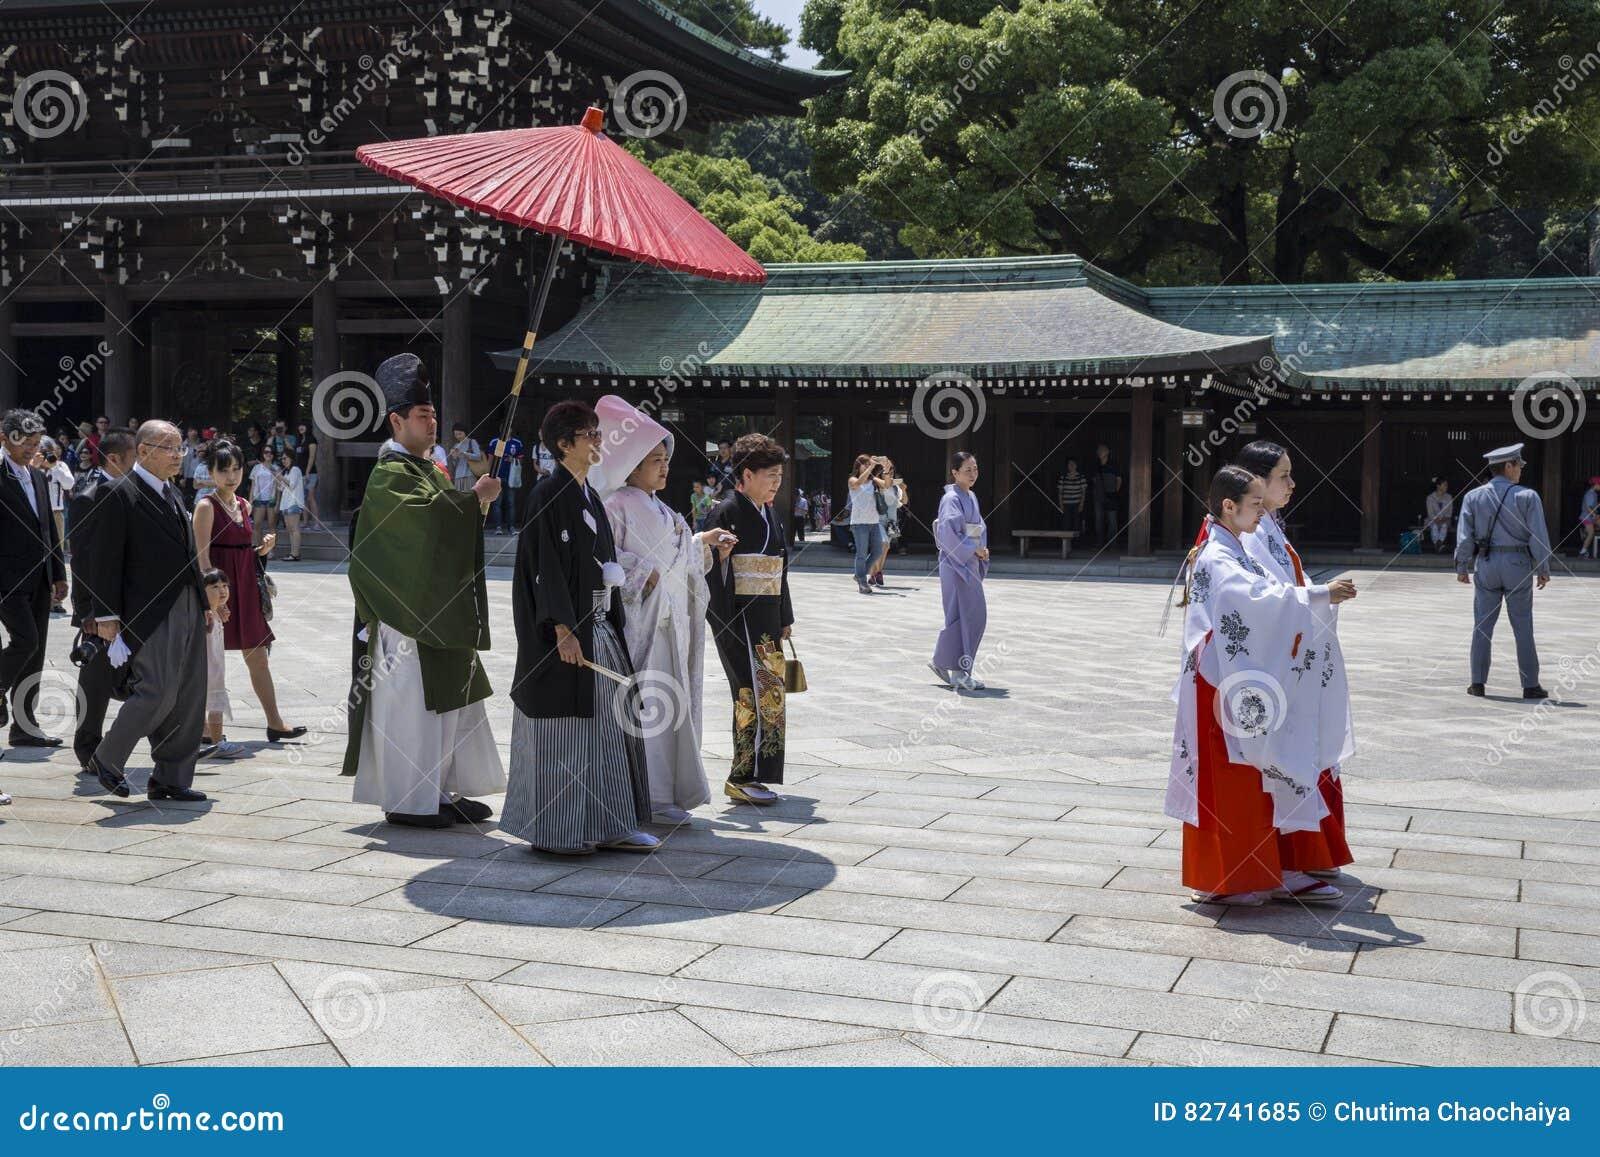 HARAJUKU, ΤΟΚΙΟ - ΤΟΝ ΙΟΎΛΙΟ ΤΟΥ 2015: Εορτασμός ενός χαρακτηριστικού γάμου cere